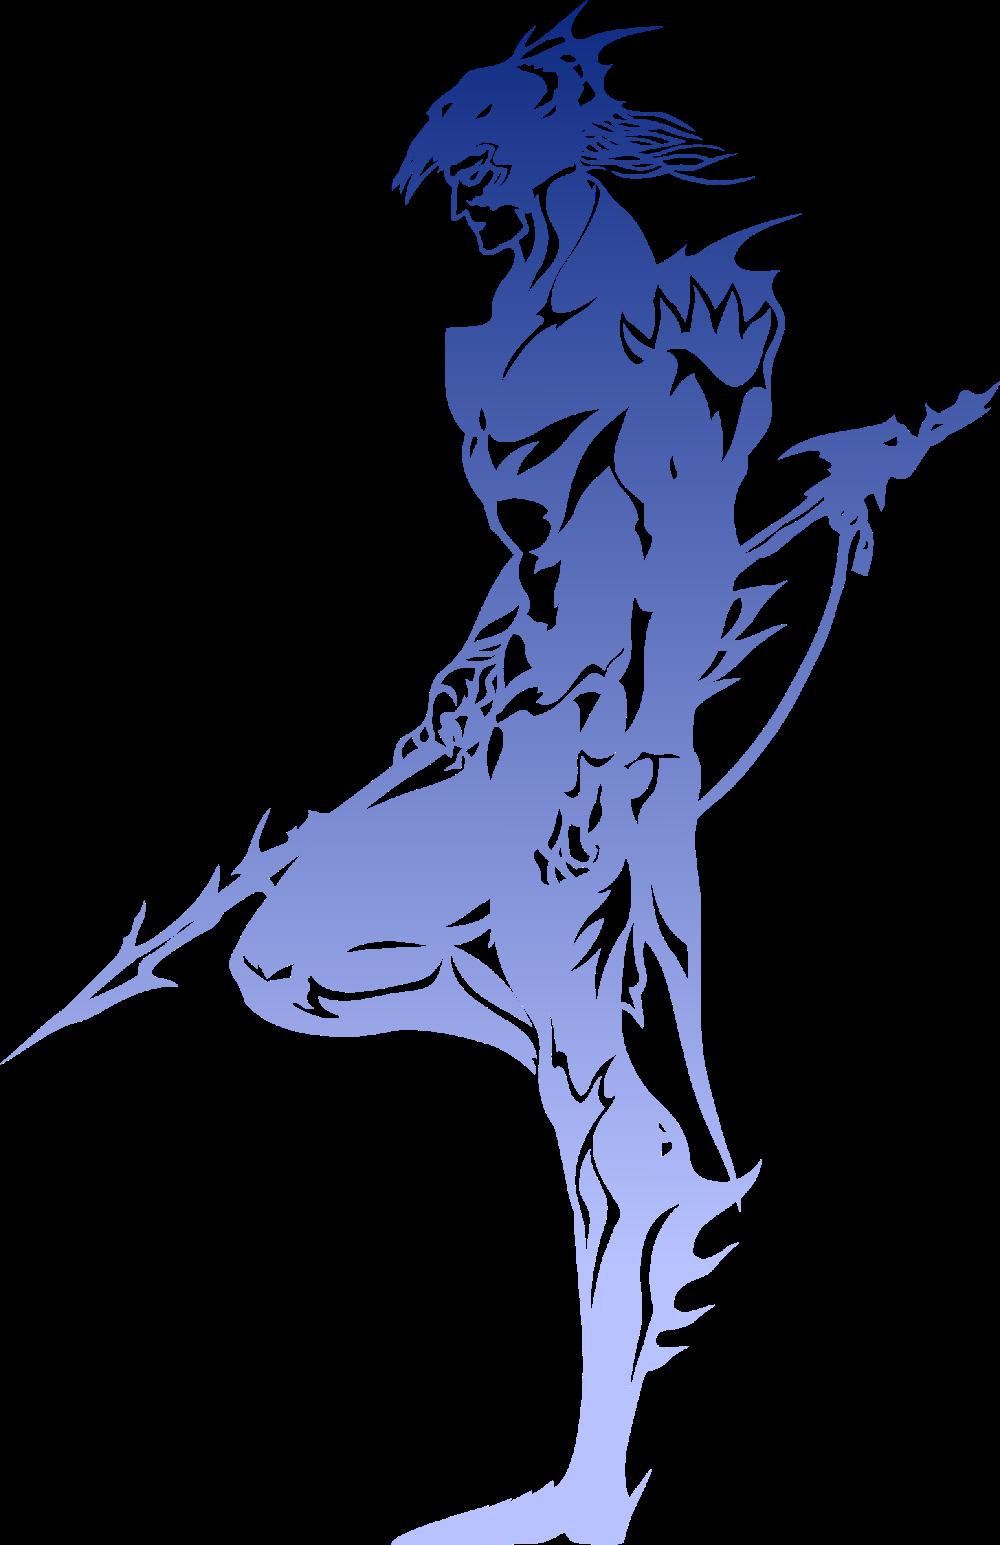 Original Final Fantasy Iv Logo By Eldi13 On Deviantart Final Fantasy Iv Final Fantasy Artwork Final Fantasy Logo